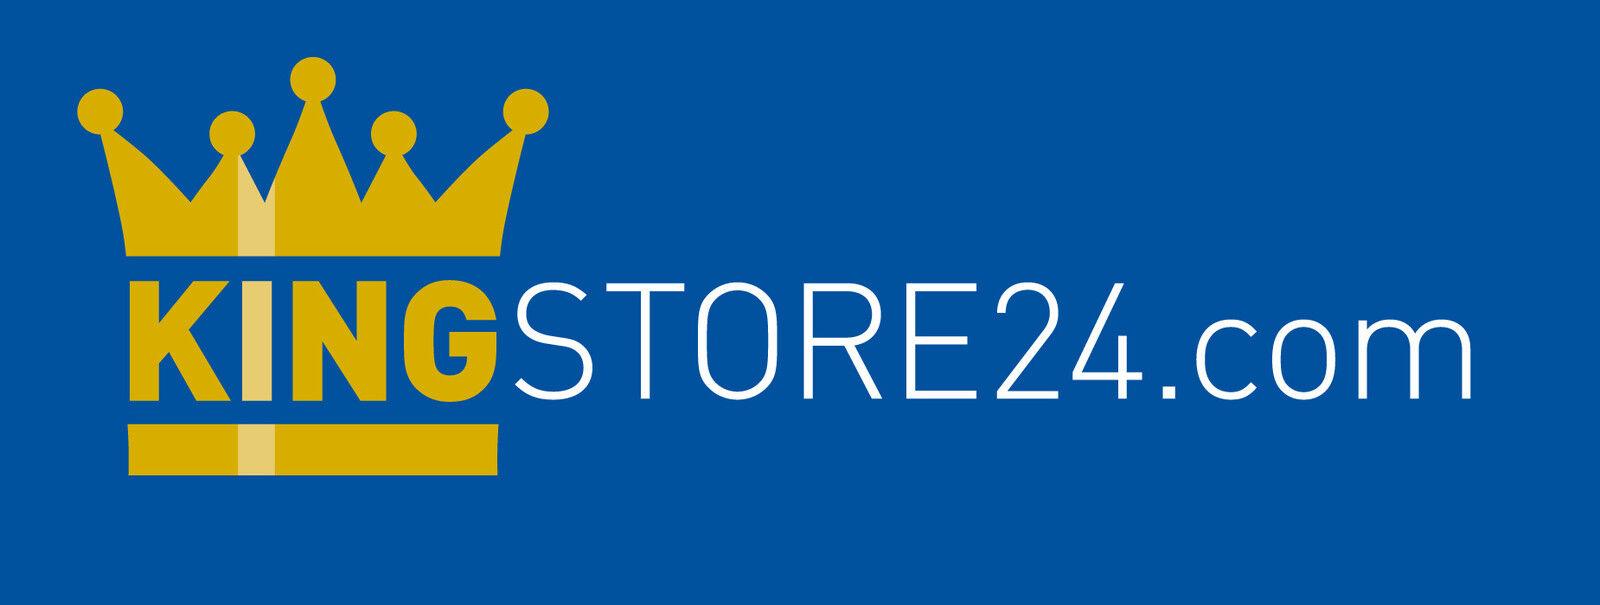 Kingstore24